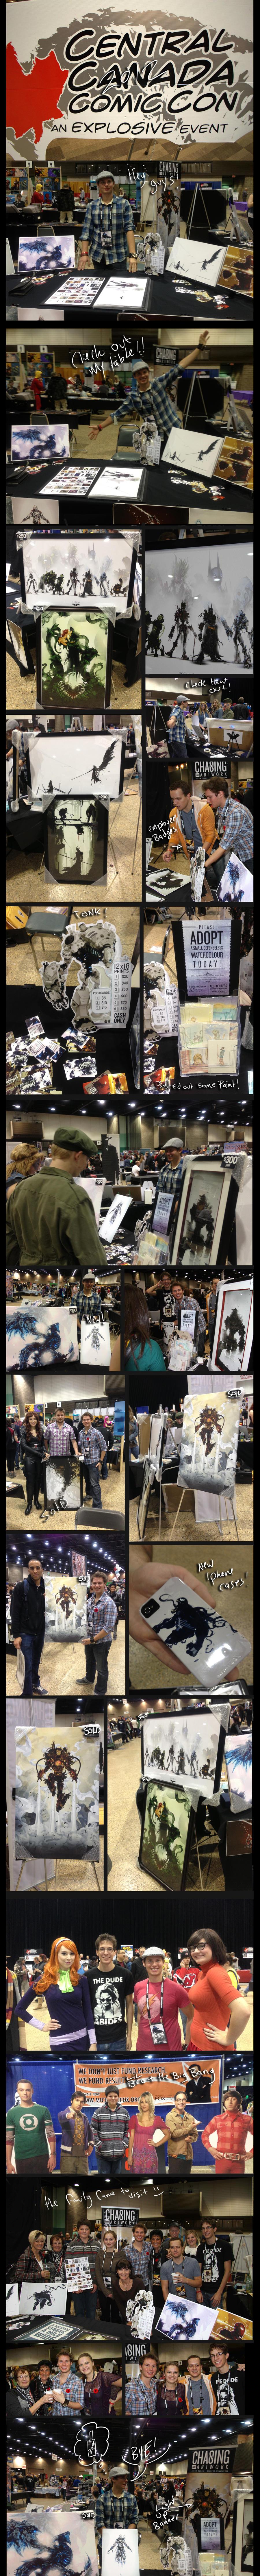 C4 Winnipeg Comic Con by ChasingArtwork